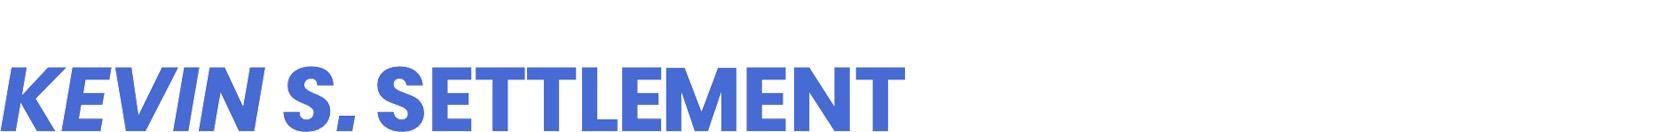 KEVIN S. SETTLEMENT